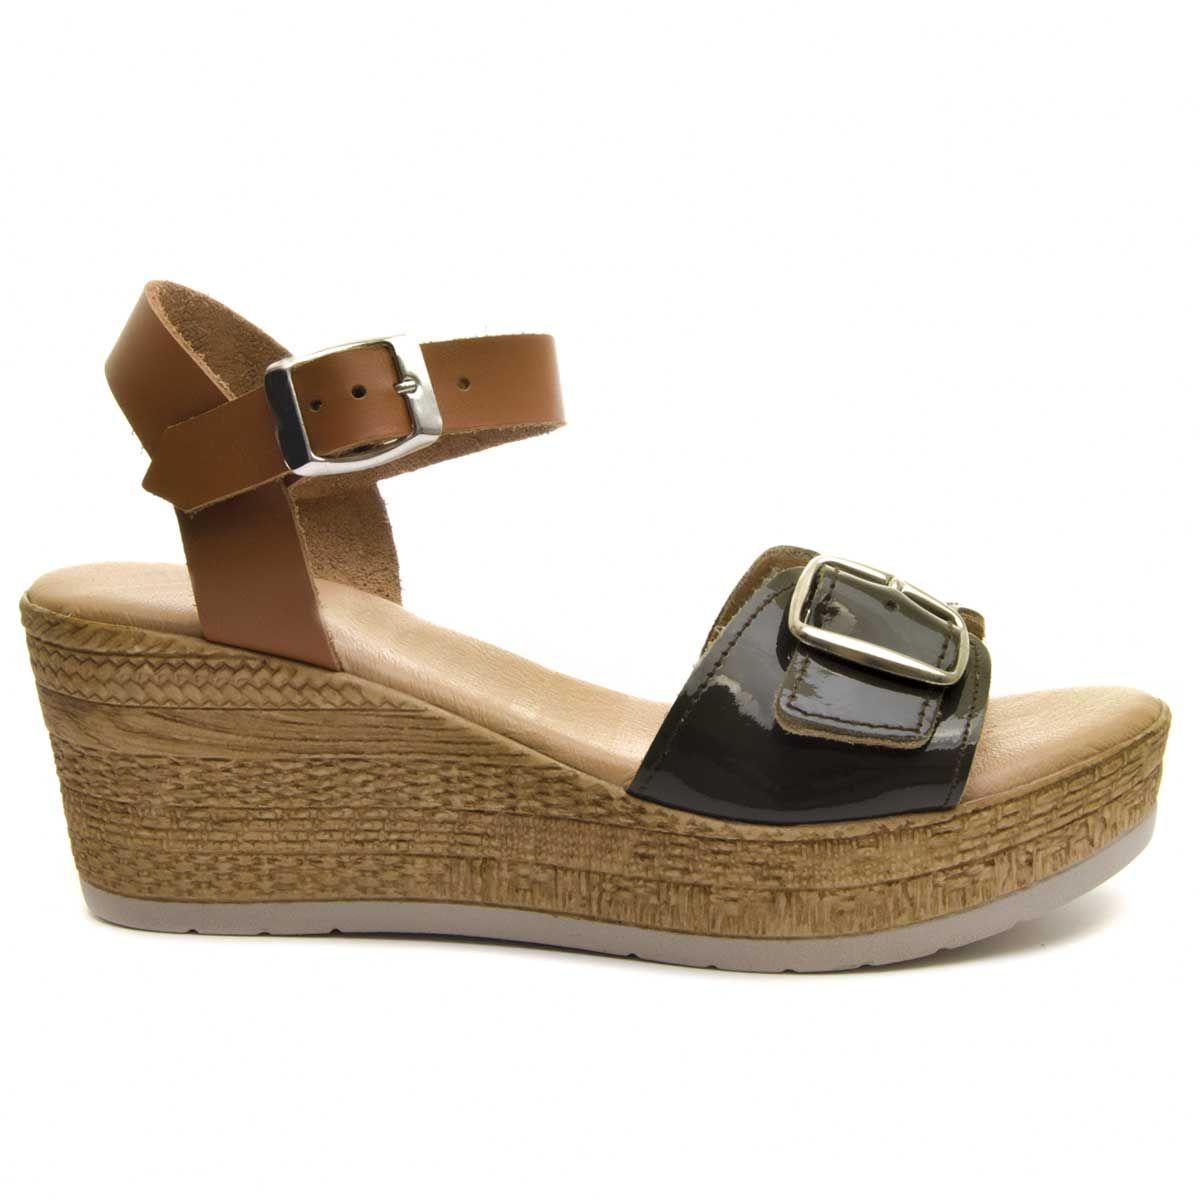 Purapiel Wedge Sandal in Green